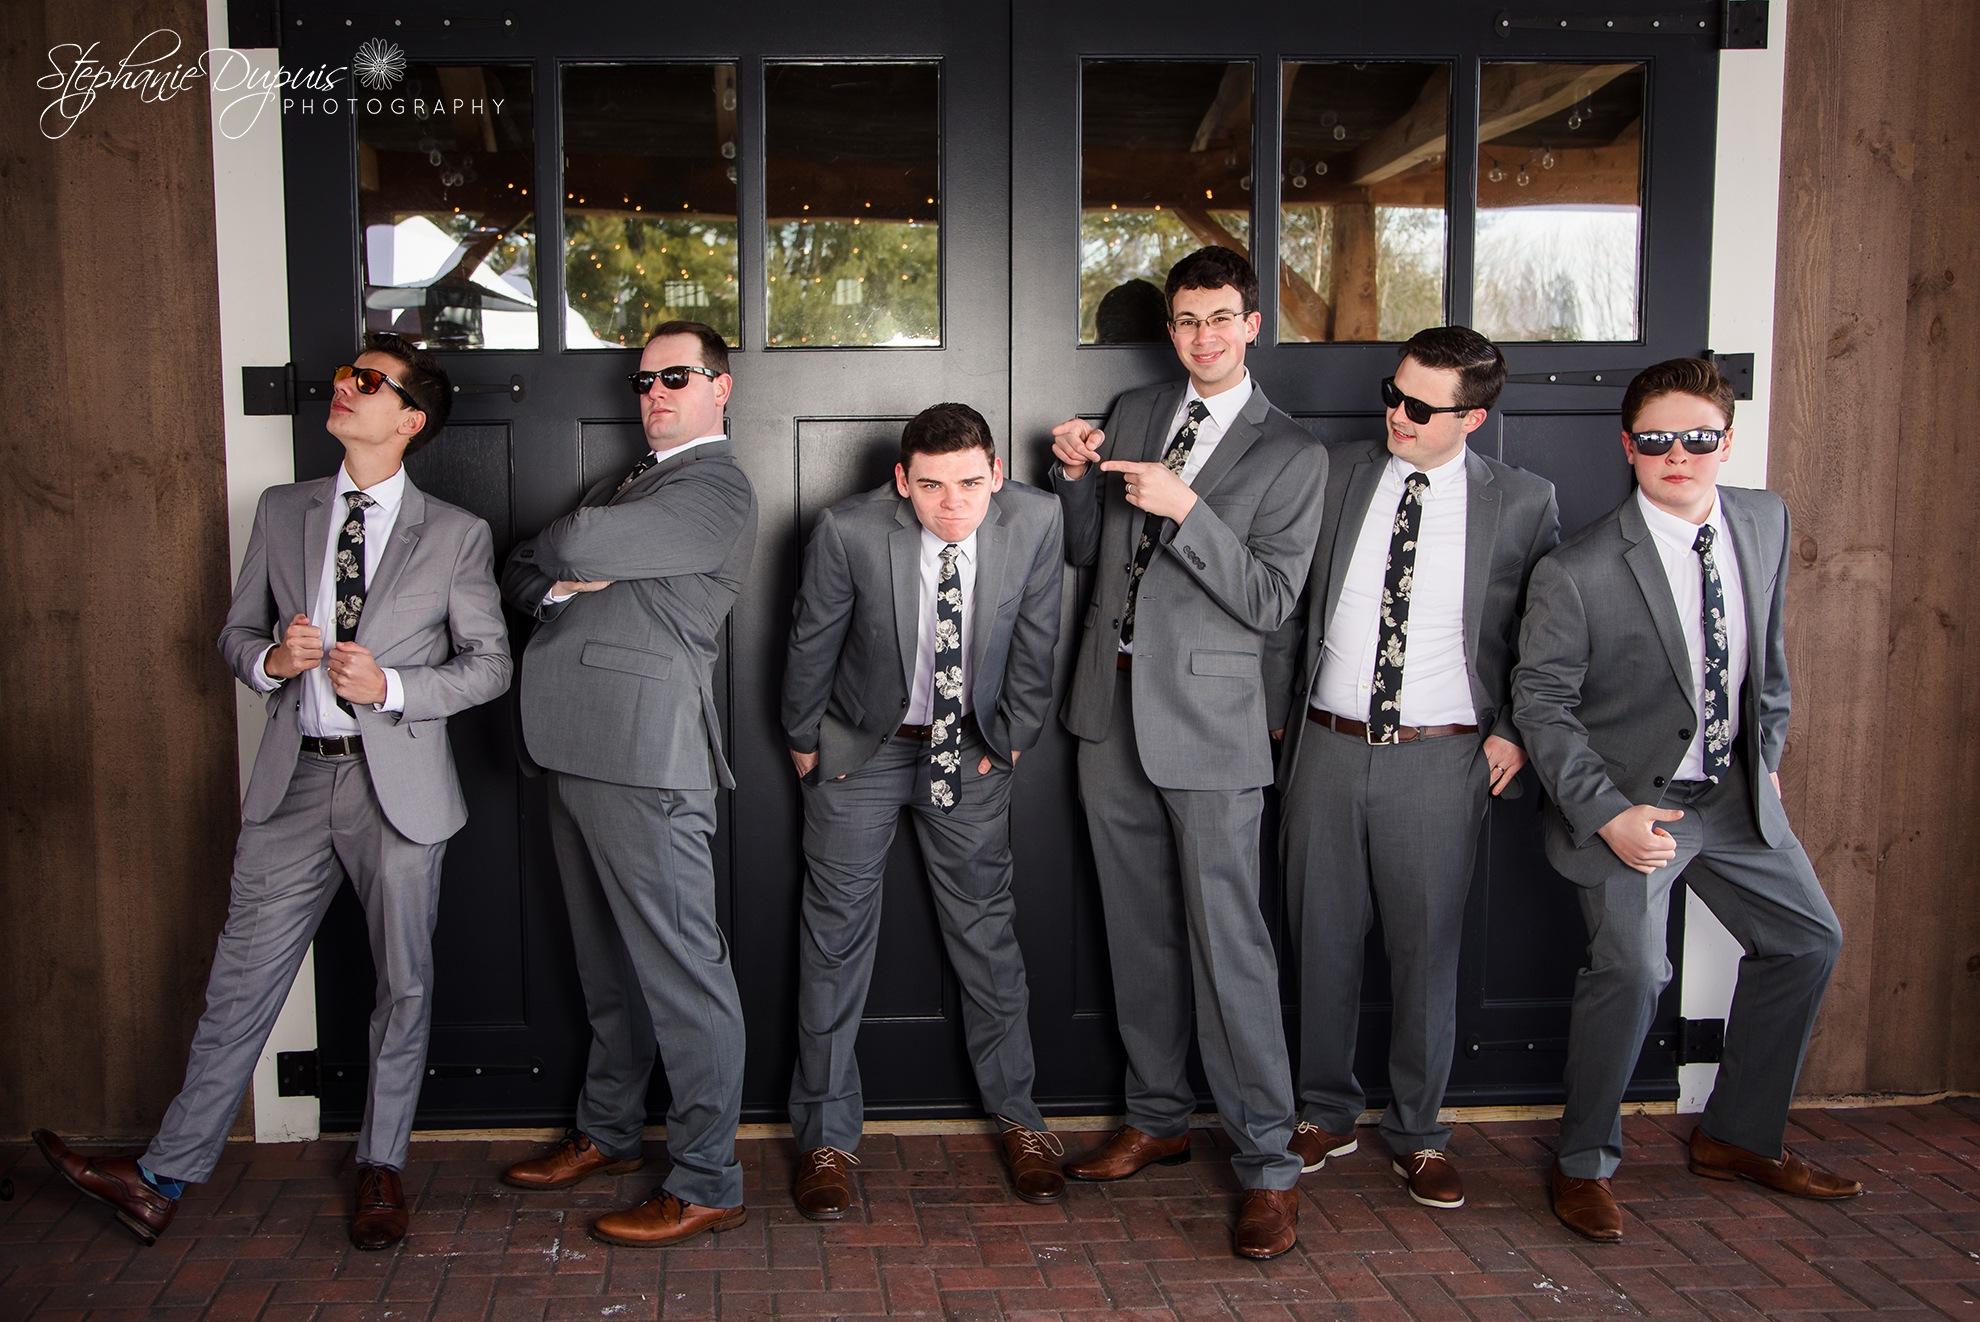 Jefferson Wedding Photographer 01 3 - Portfolio: Kittle Wedding